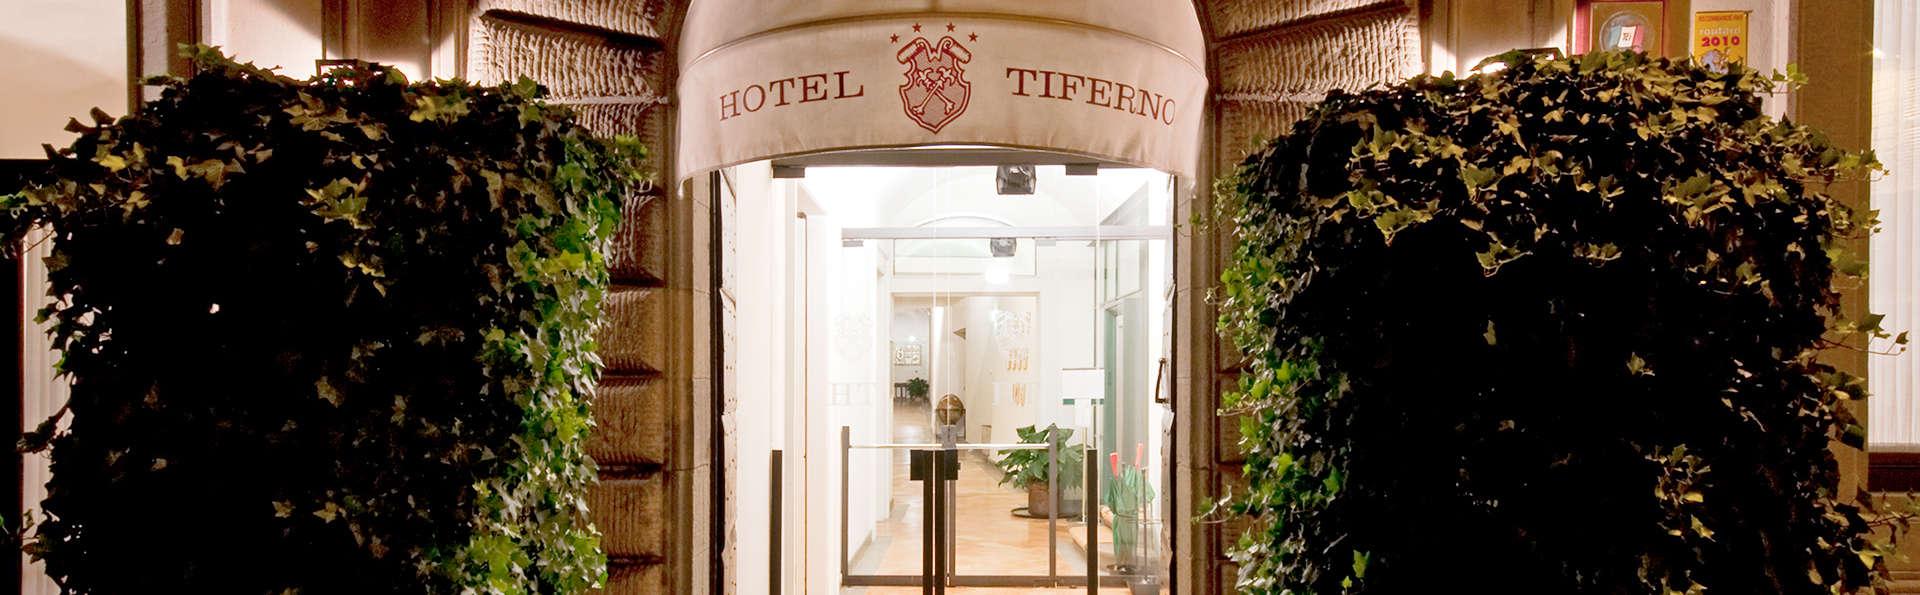 Hotel Tiferno - Edit_Front2.jpg